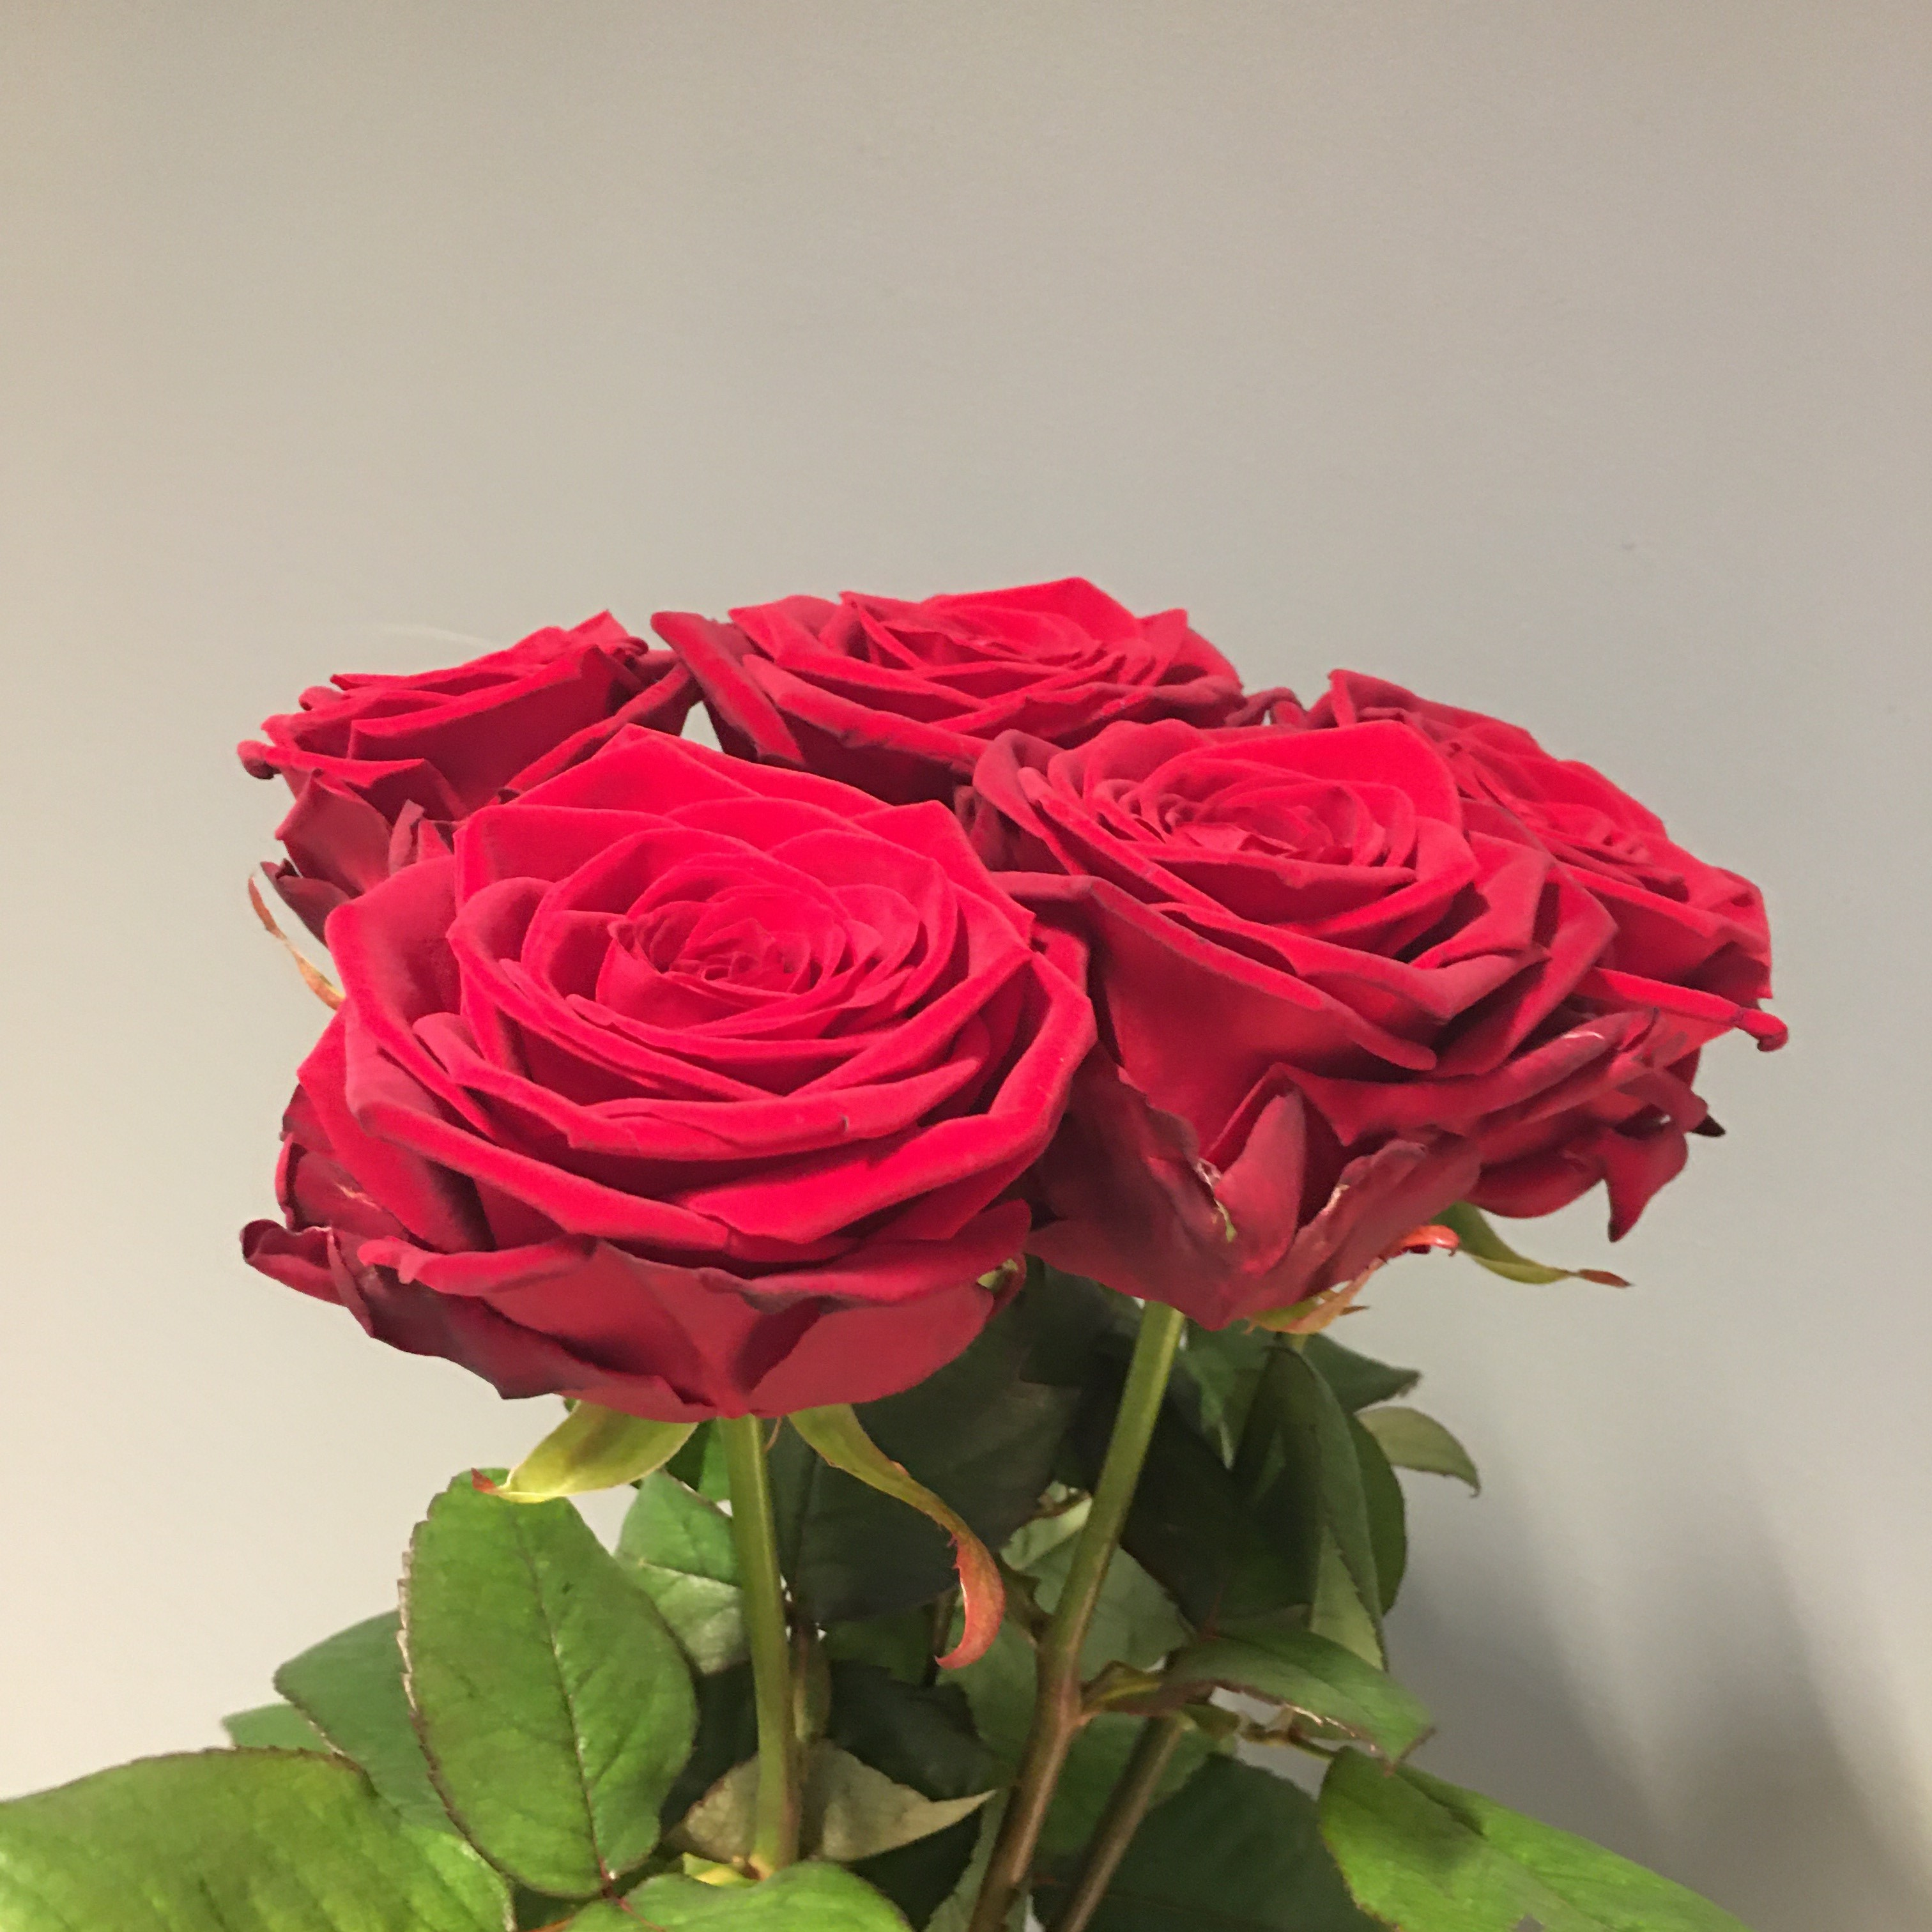 Stor röd ros